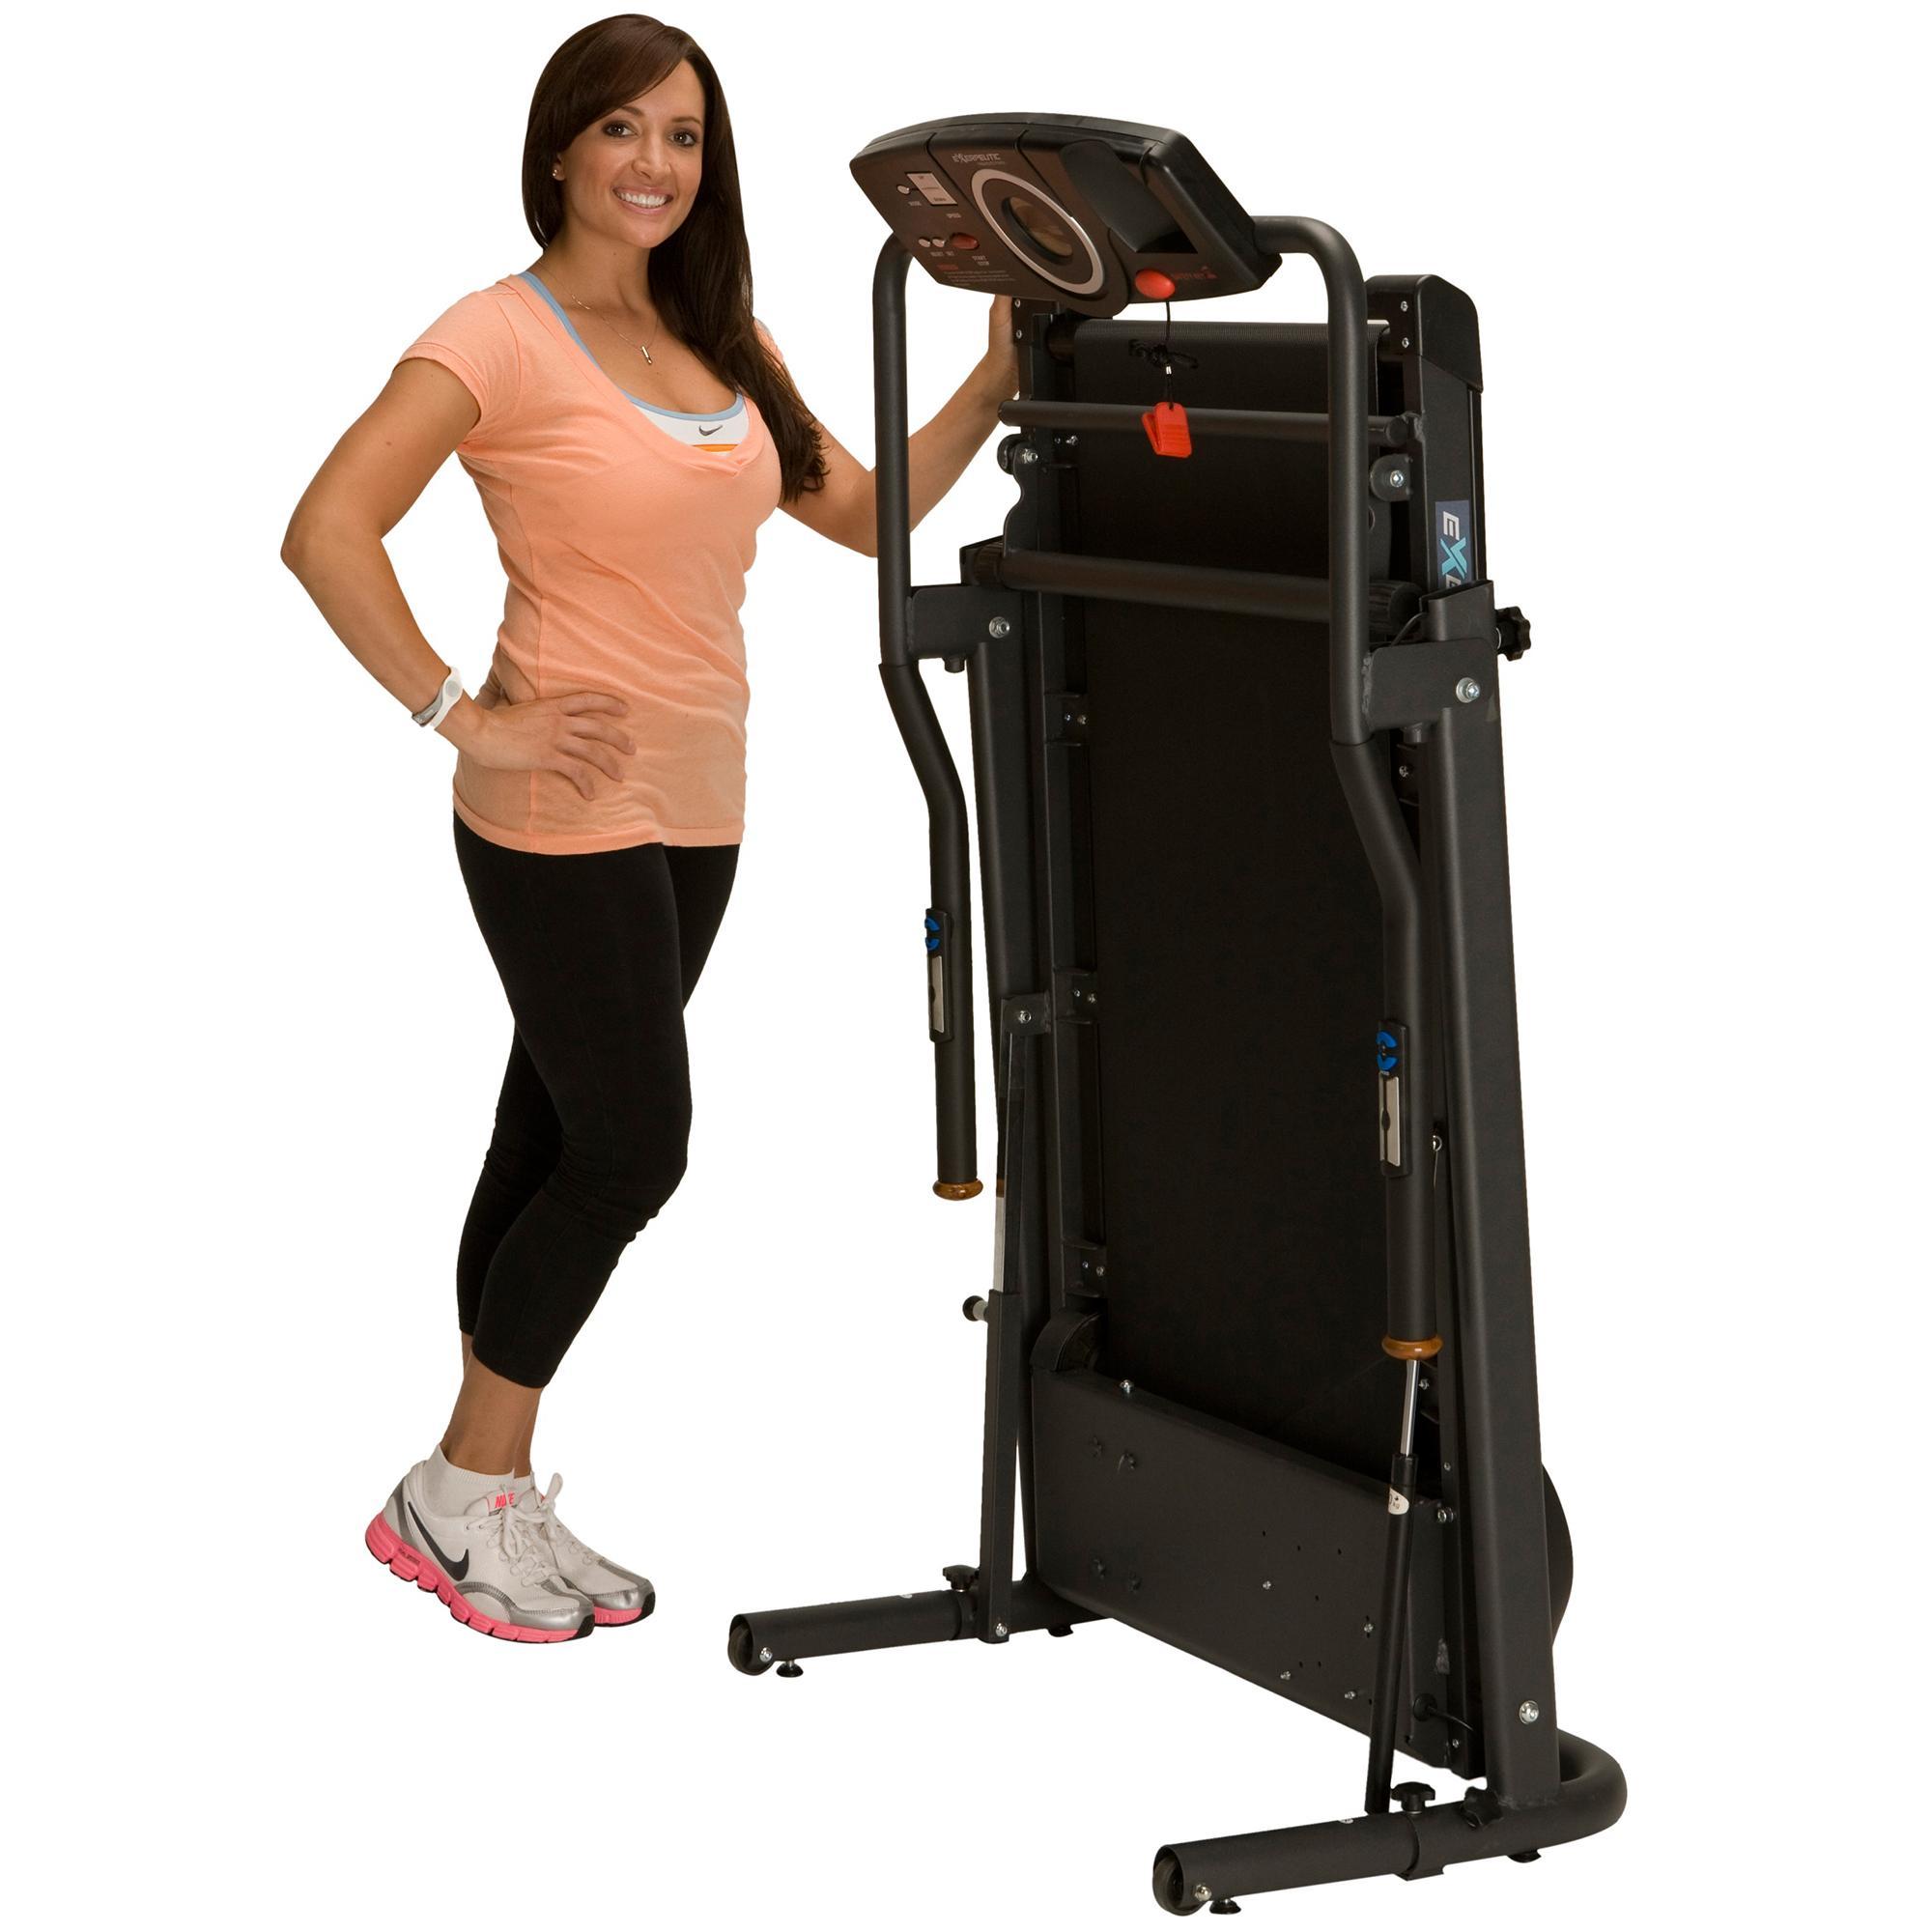 Life Fitness Treadmill Belt Size: Amazon.com : Exerpeutic TF1000 Ultra High Capacity Walk To